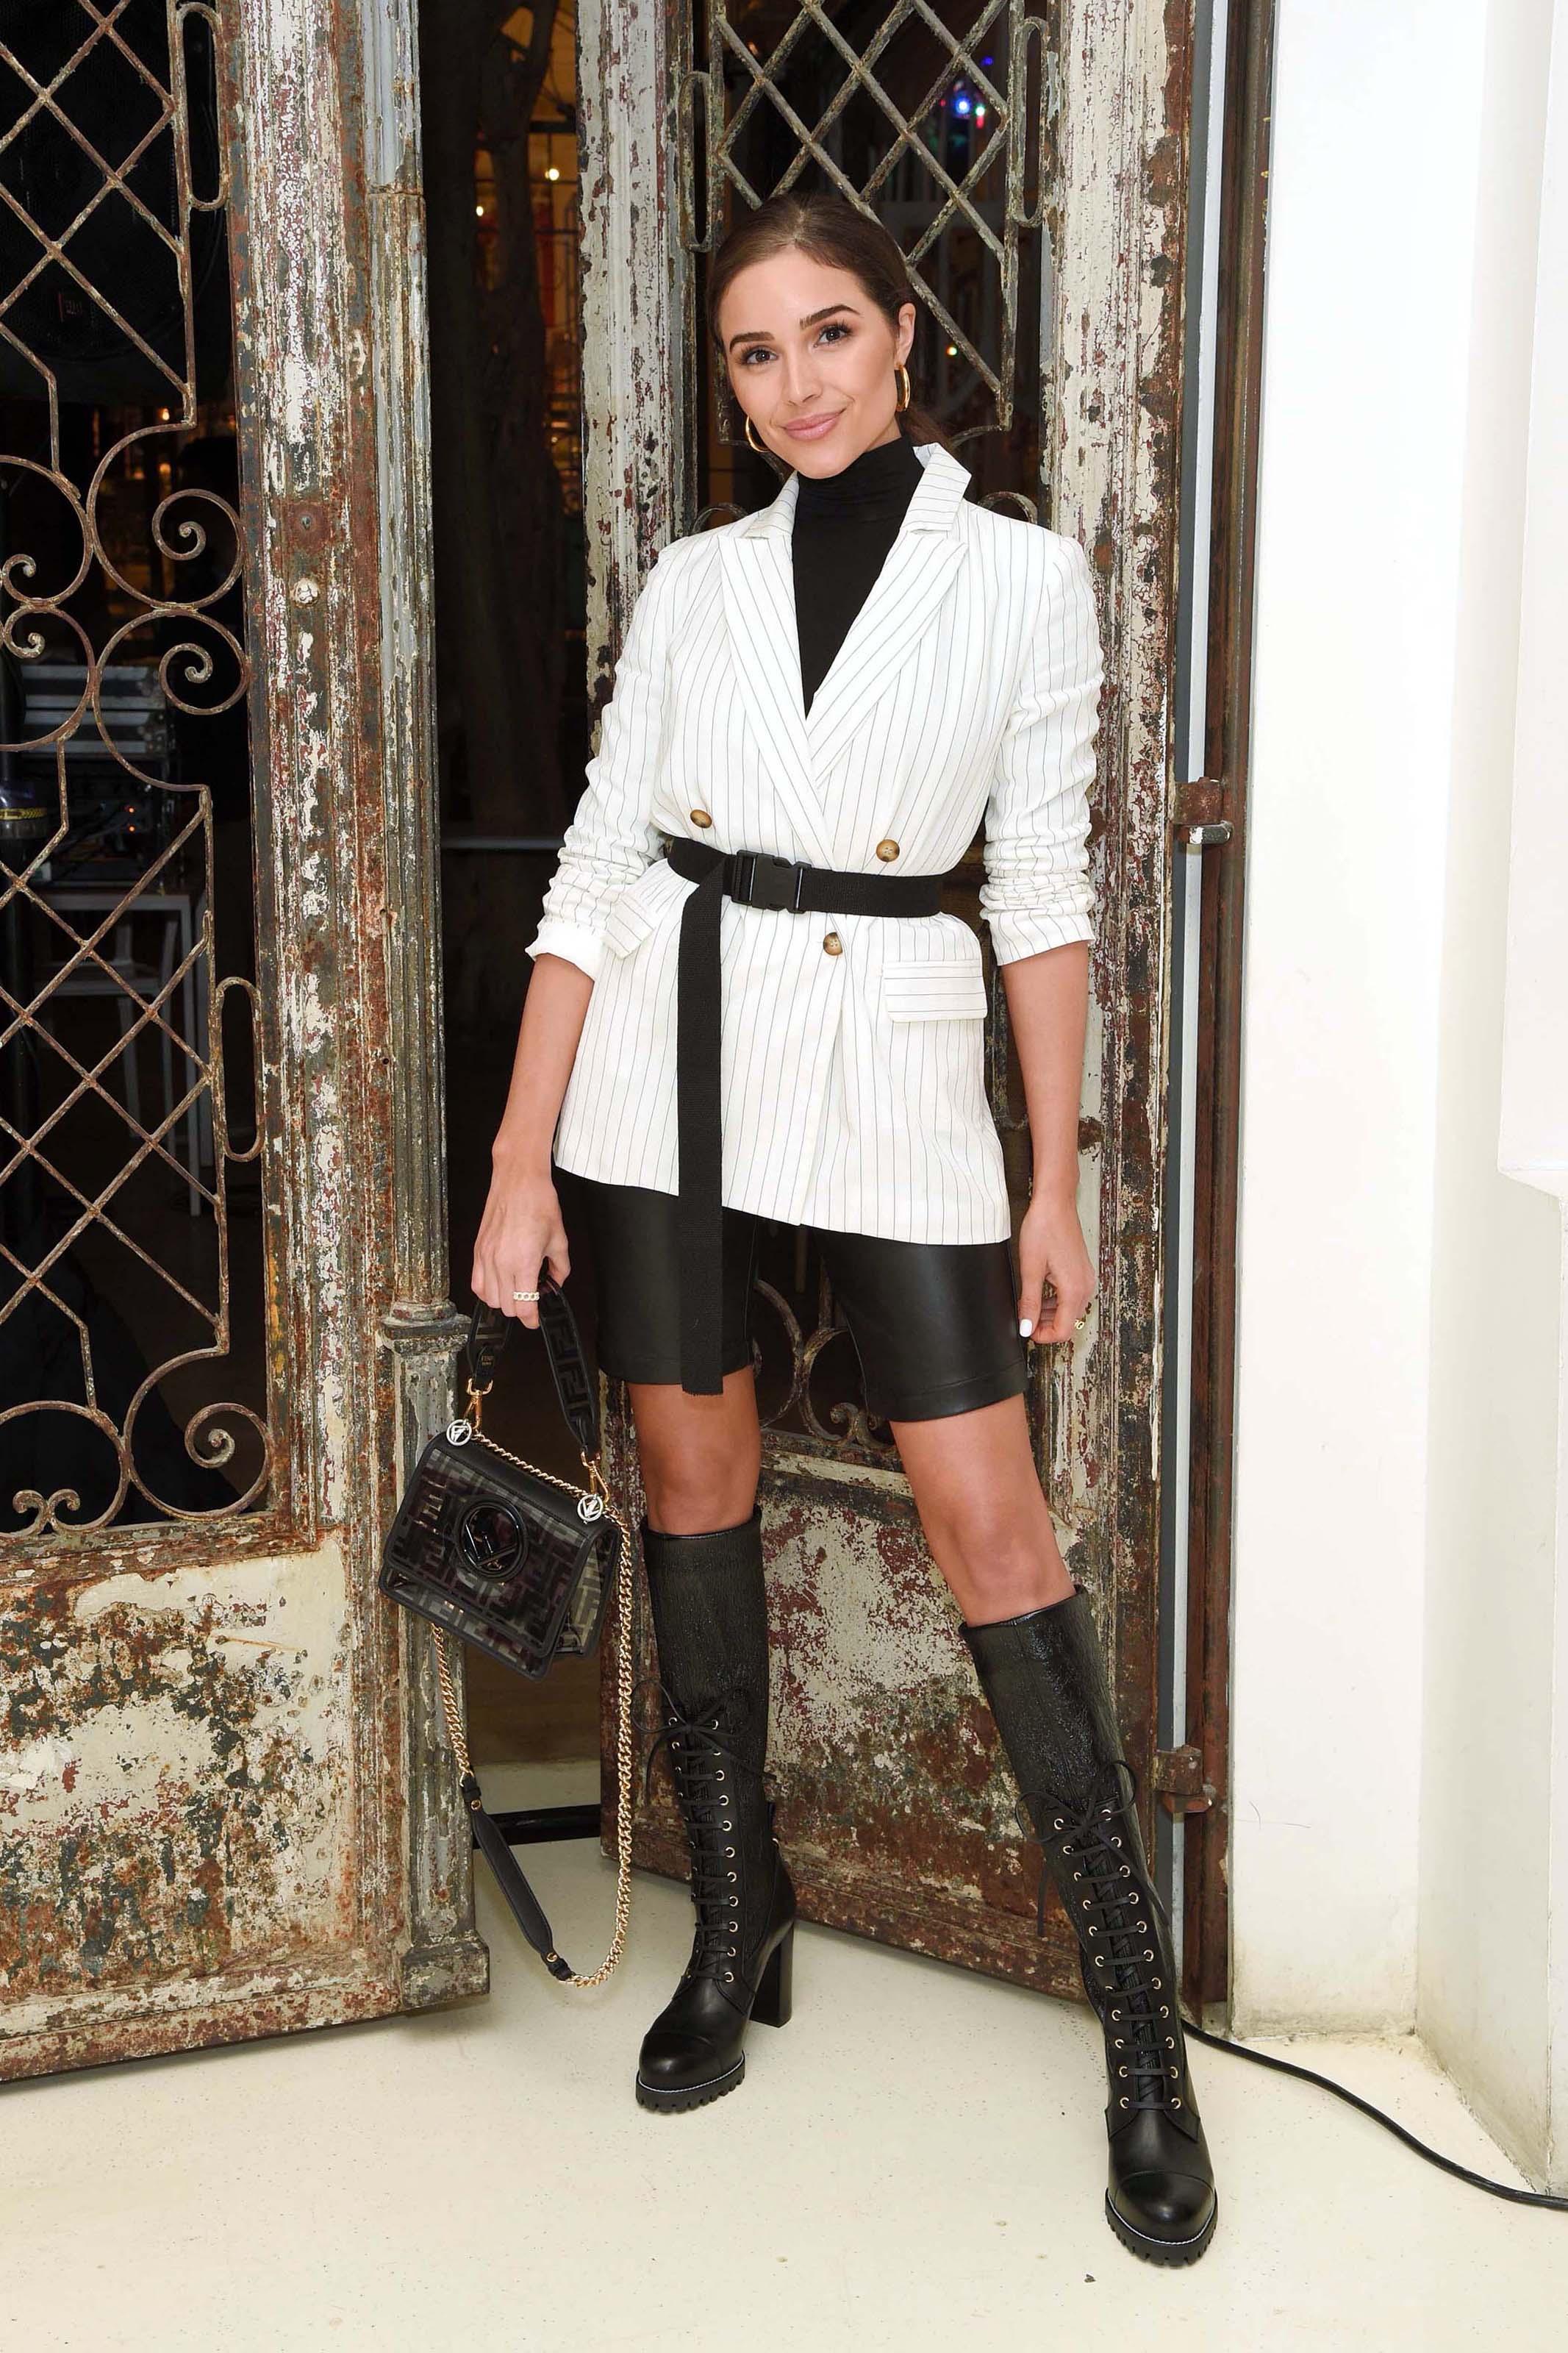 Olivia Culpo attends Express x Olivia Culpo Press Breakfast Event